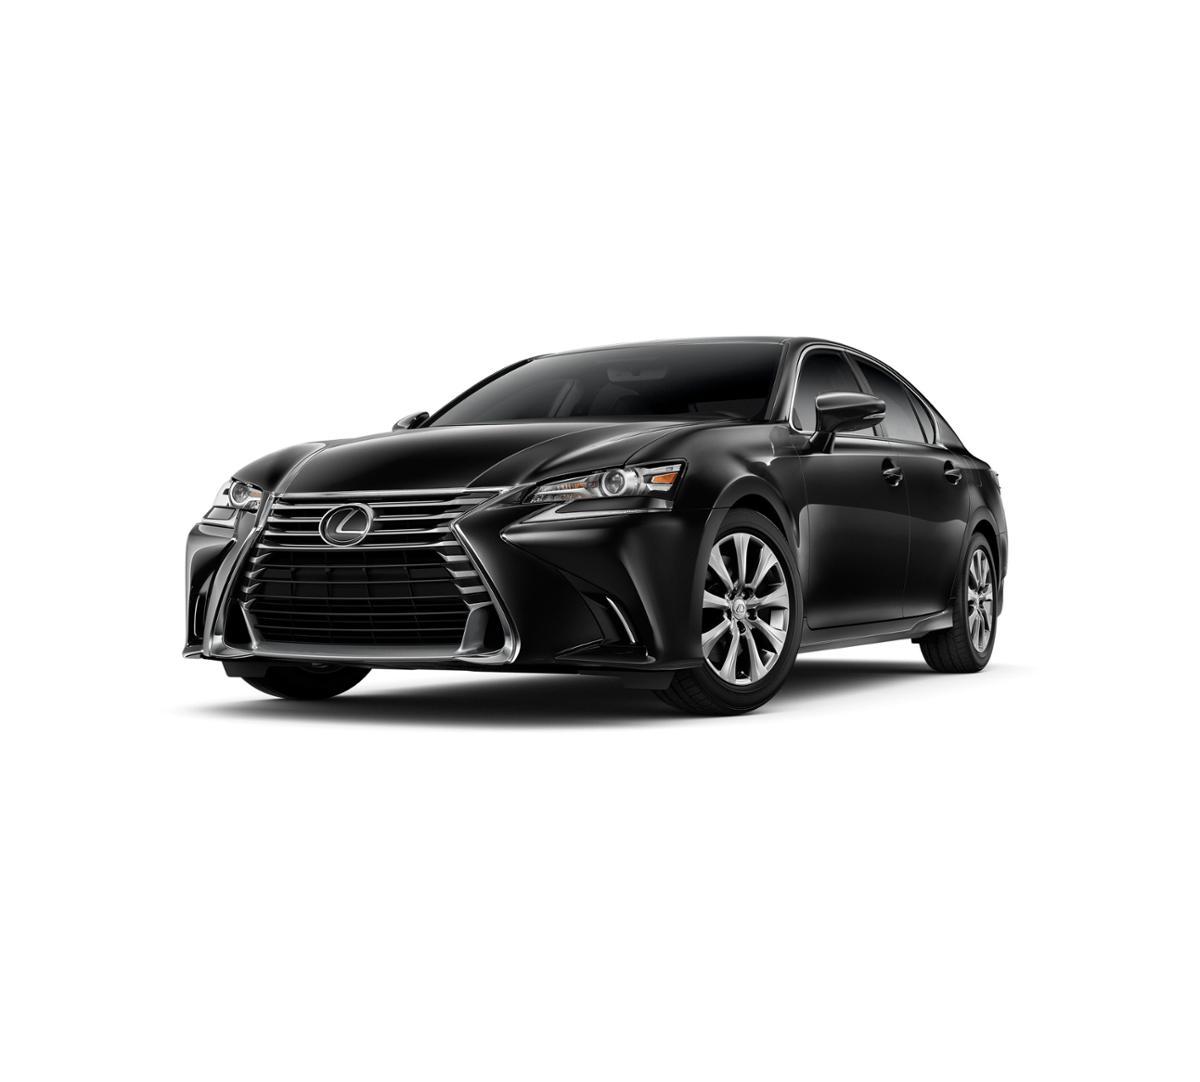 Lexus Gs Lease: 2017 Lexus GS Turbo